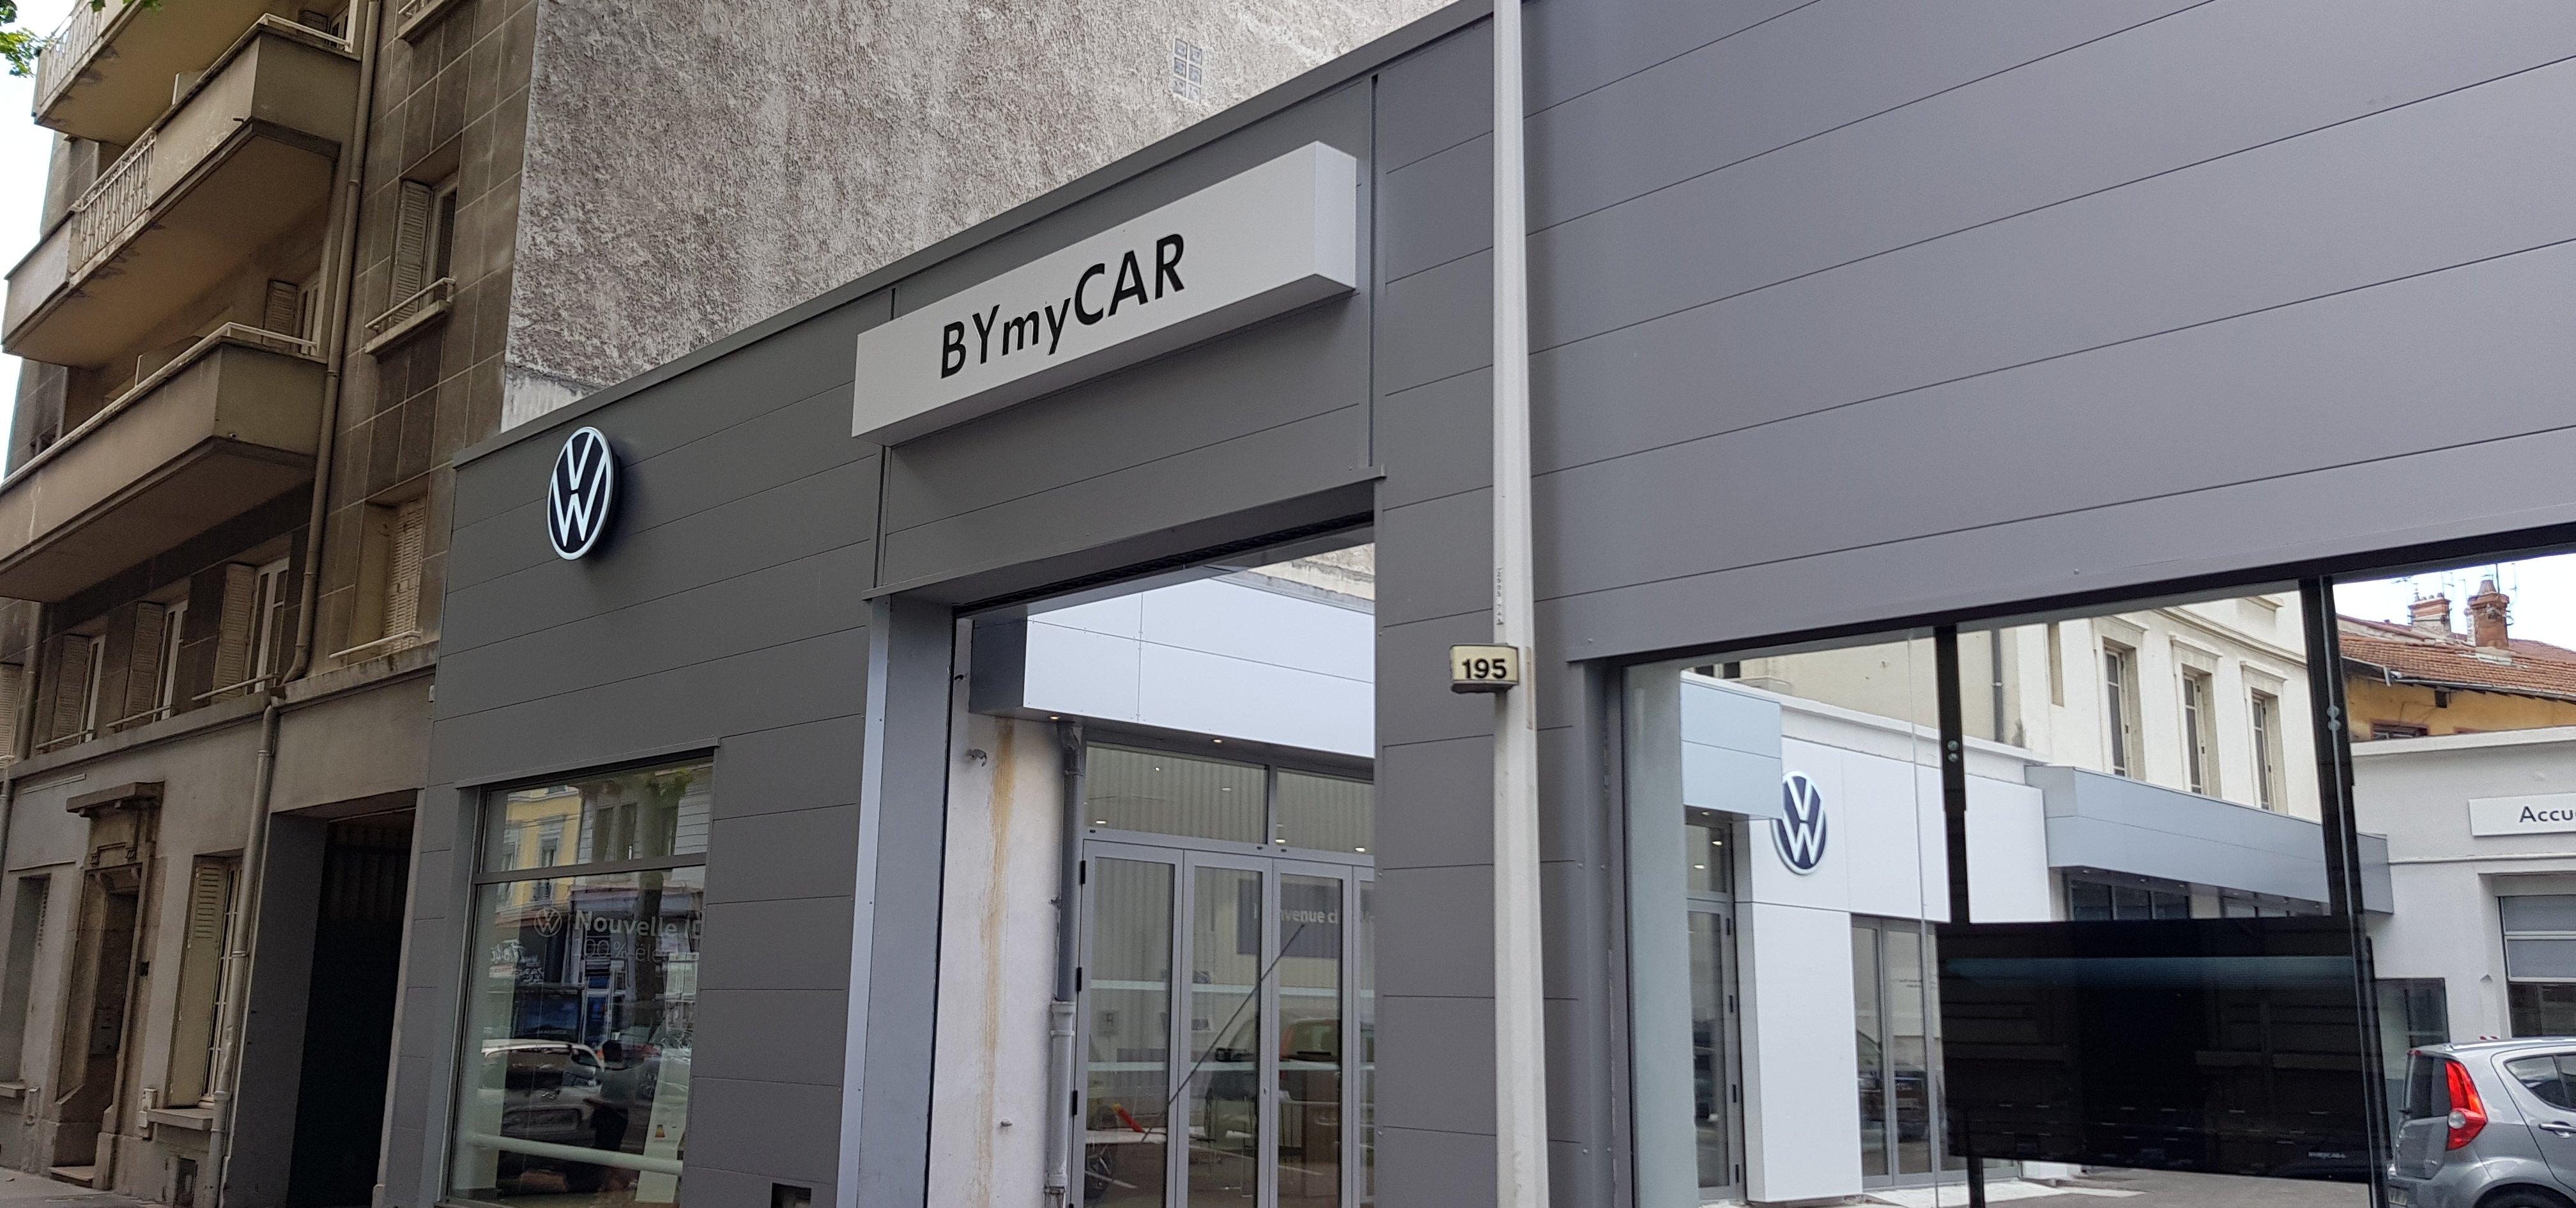 VOLKSWAGEN BYmyCAR Lyon